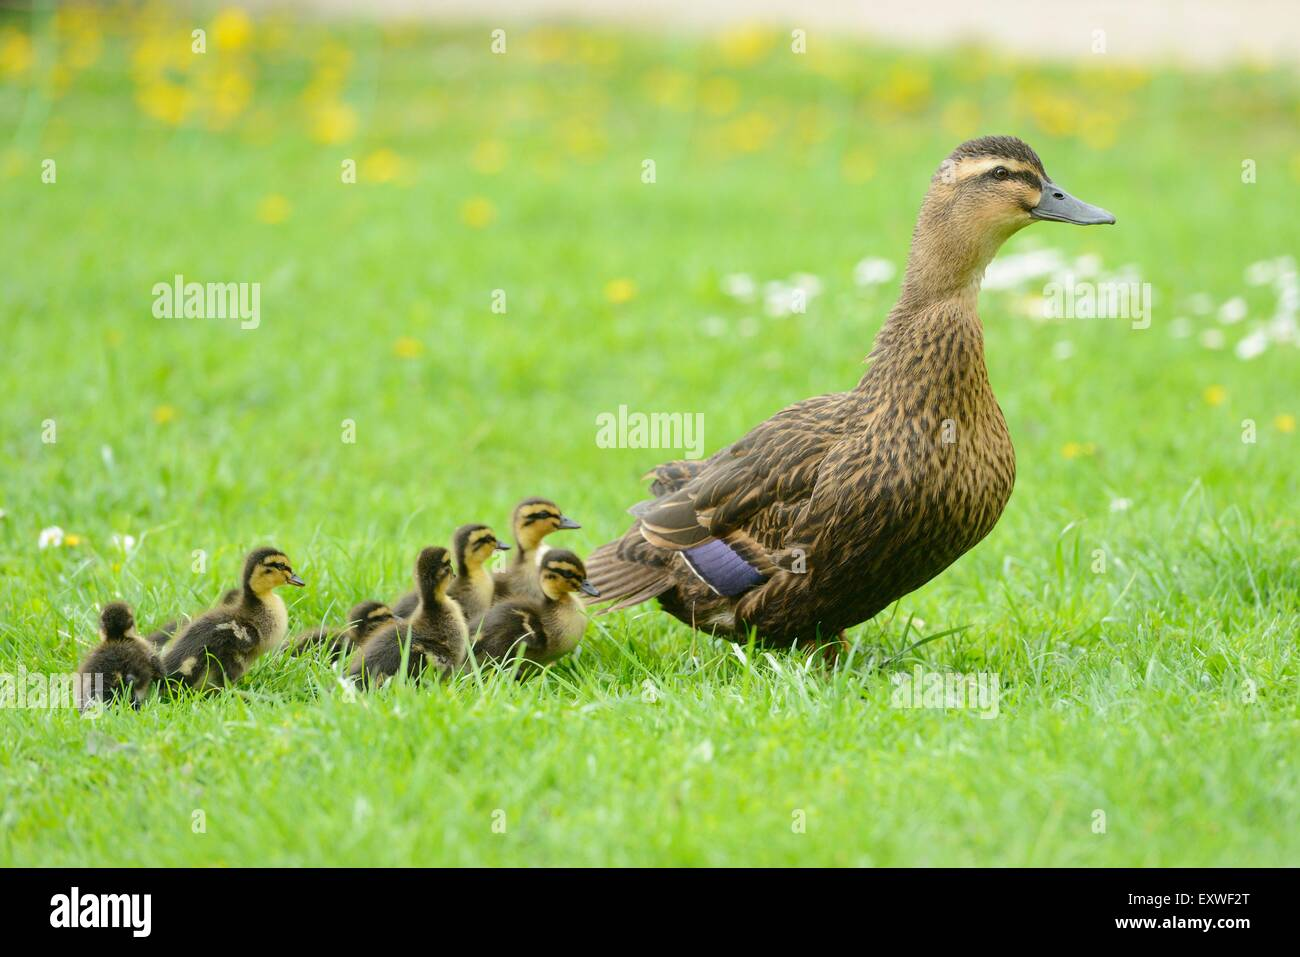 Patos pollitos animal pradera XXL muro imagen fotografía póster p0102